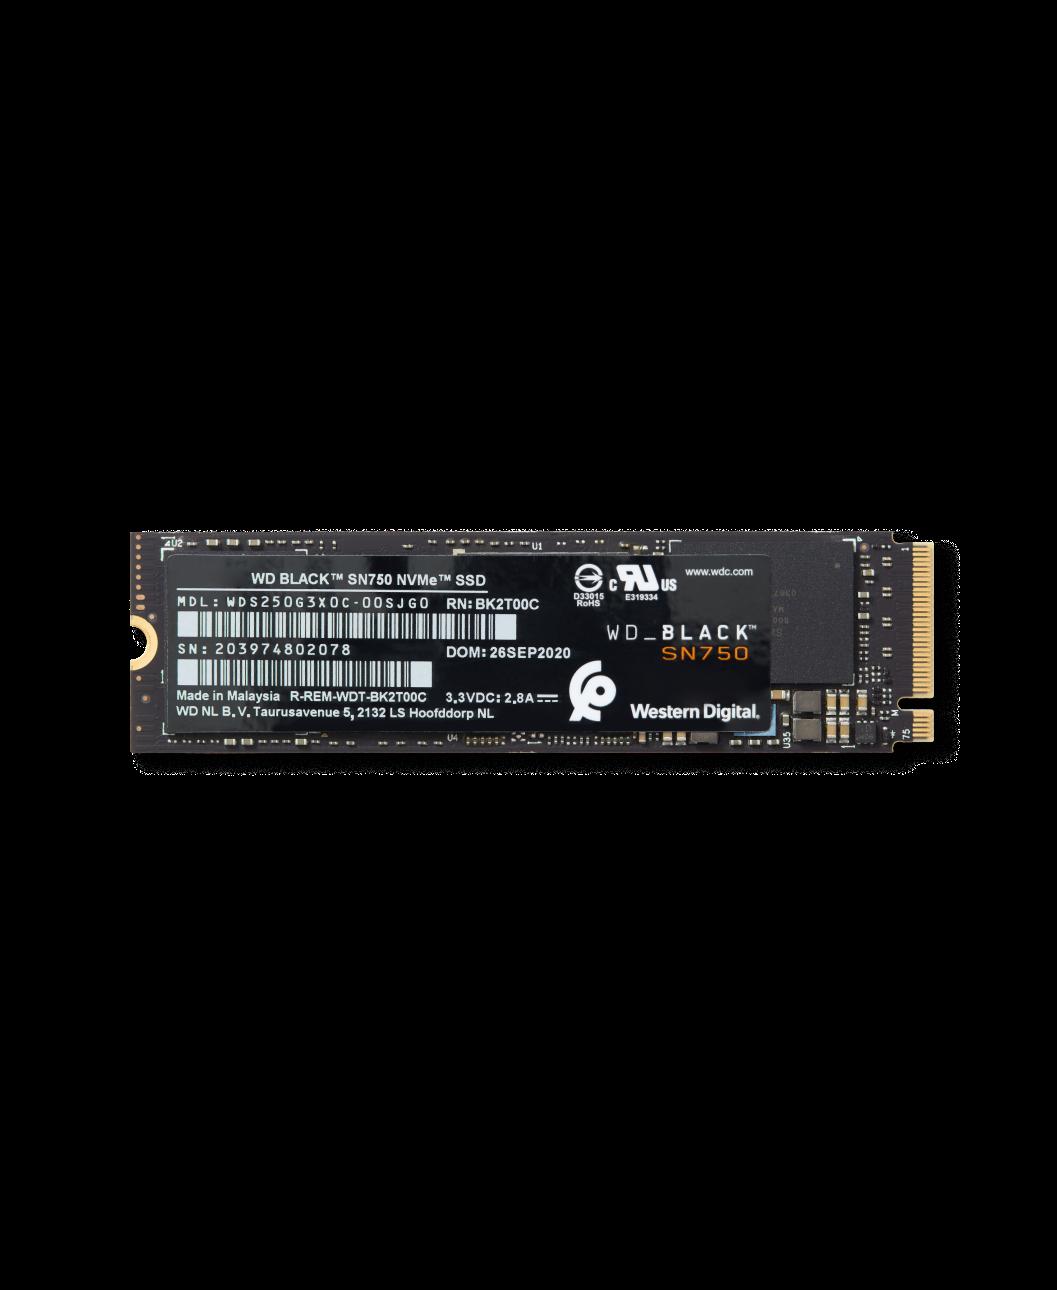 WD_BLACK™ SN750 NVMe™